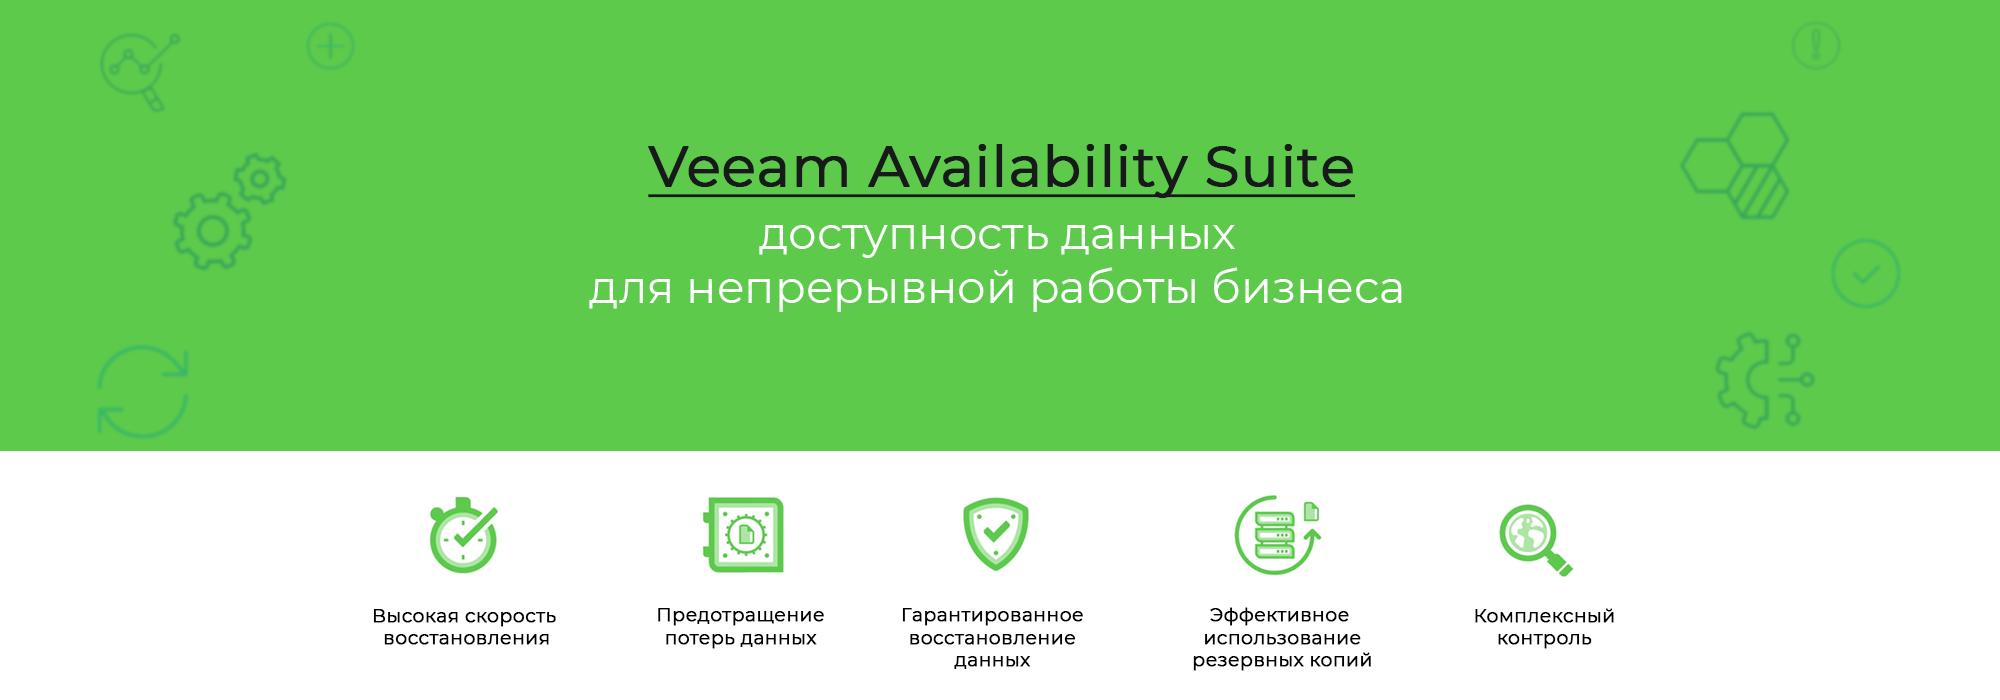 Veeam-Availability-Suite-резервное-копирование-и-репликация